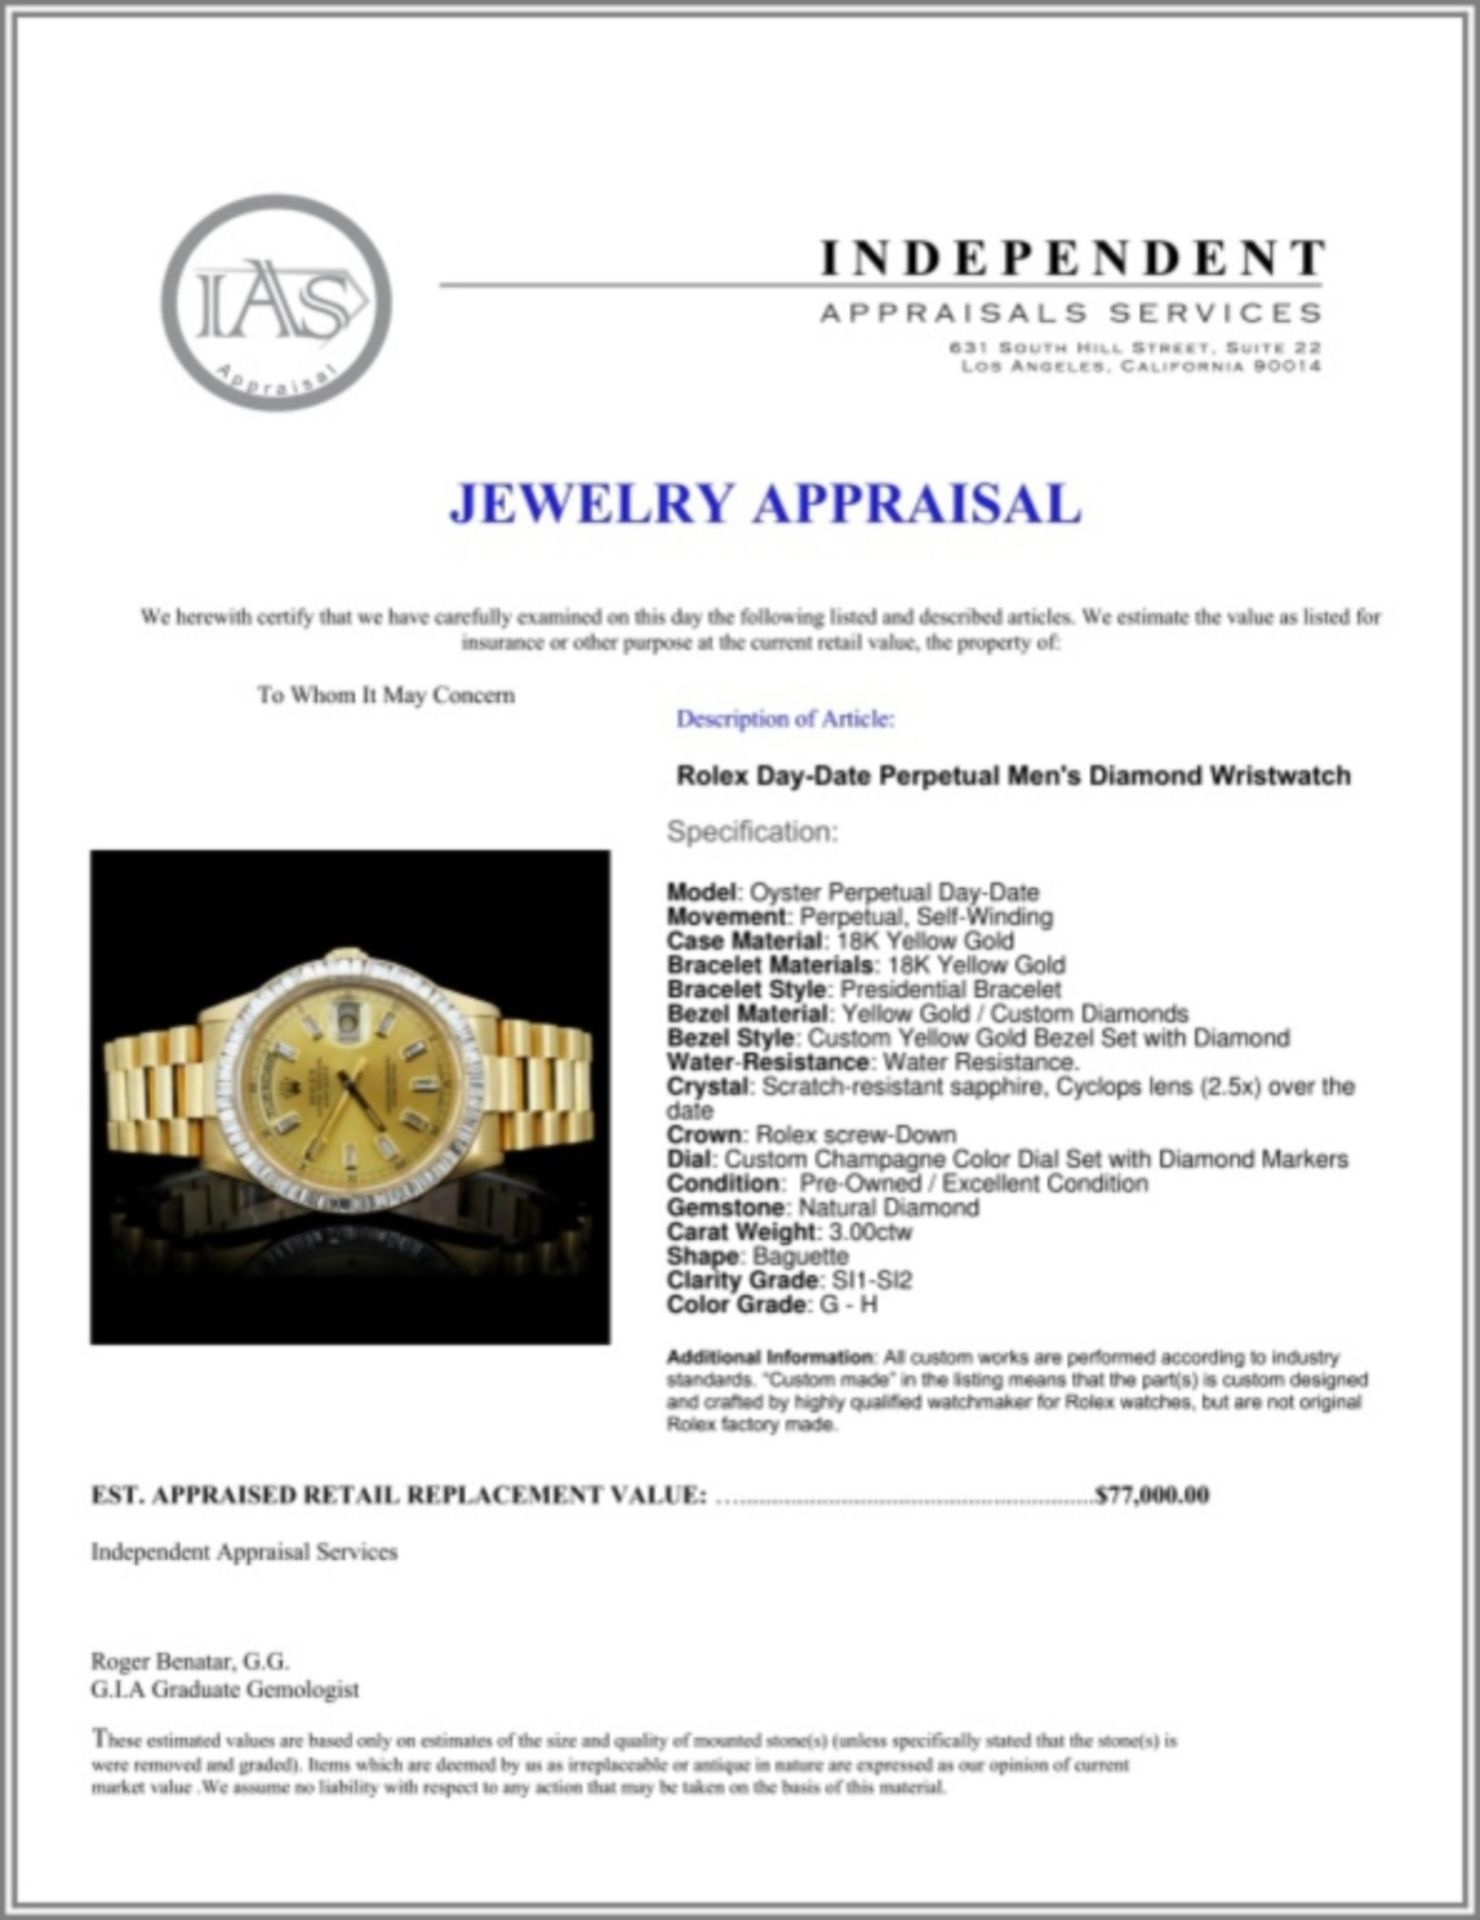 Rolex Day-Date Diamond 36mm Wristwatch - Image 6 of 6